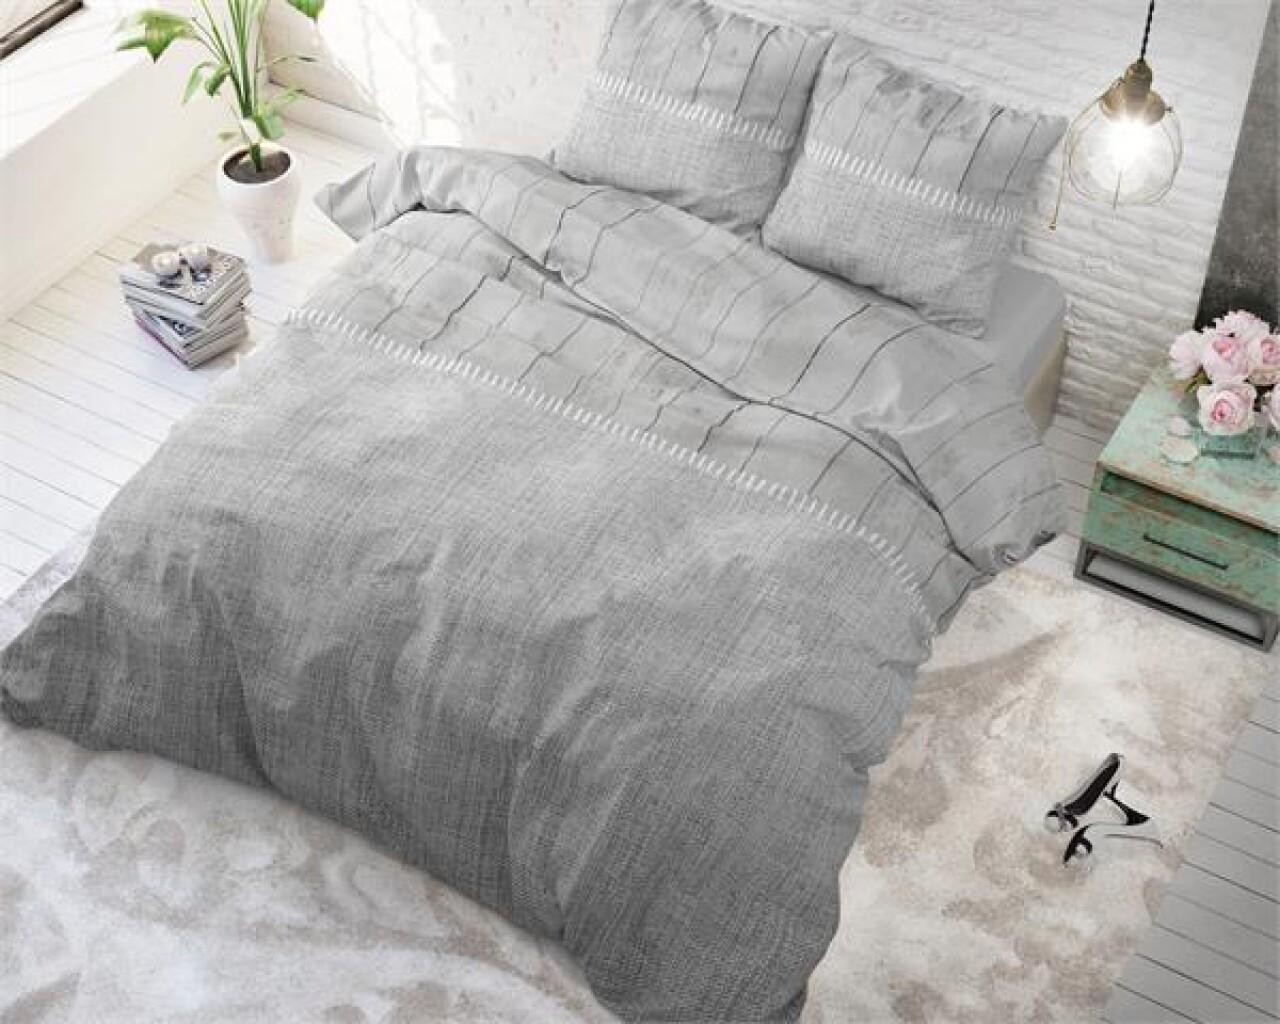 Lenjerie de pat pentru doua persoane Wood Fabric Grey, Royal Textile,100% bumbac